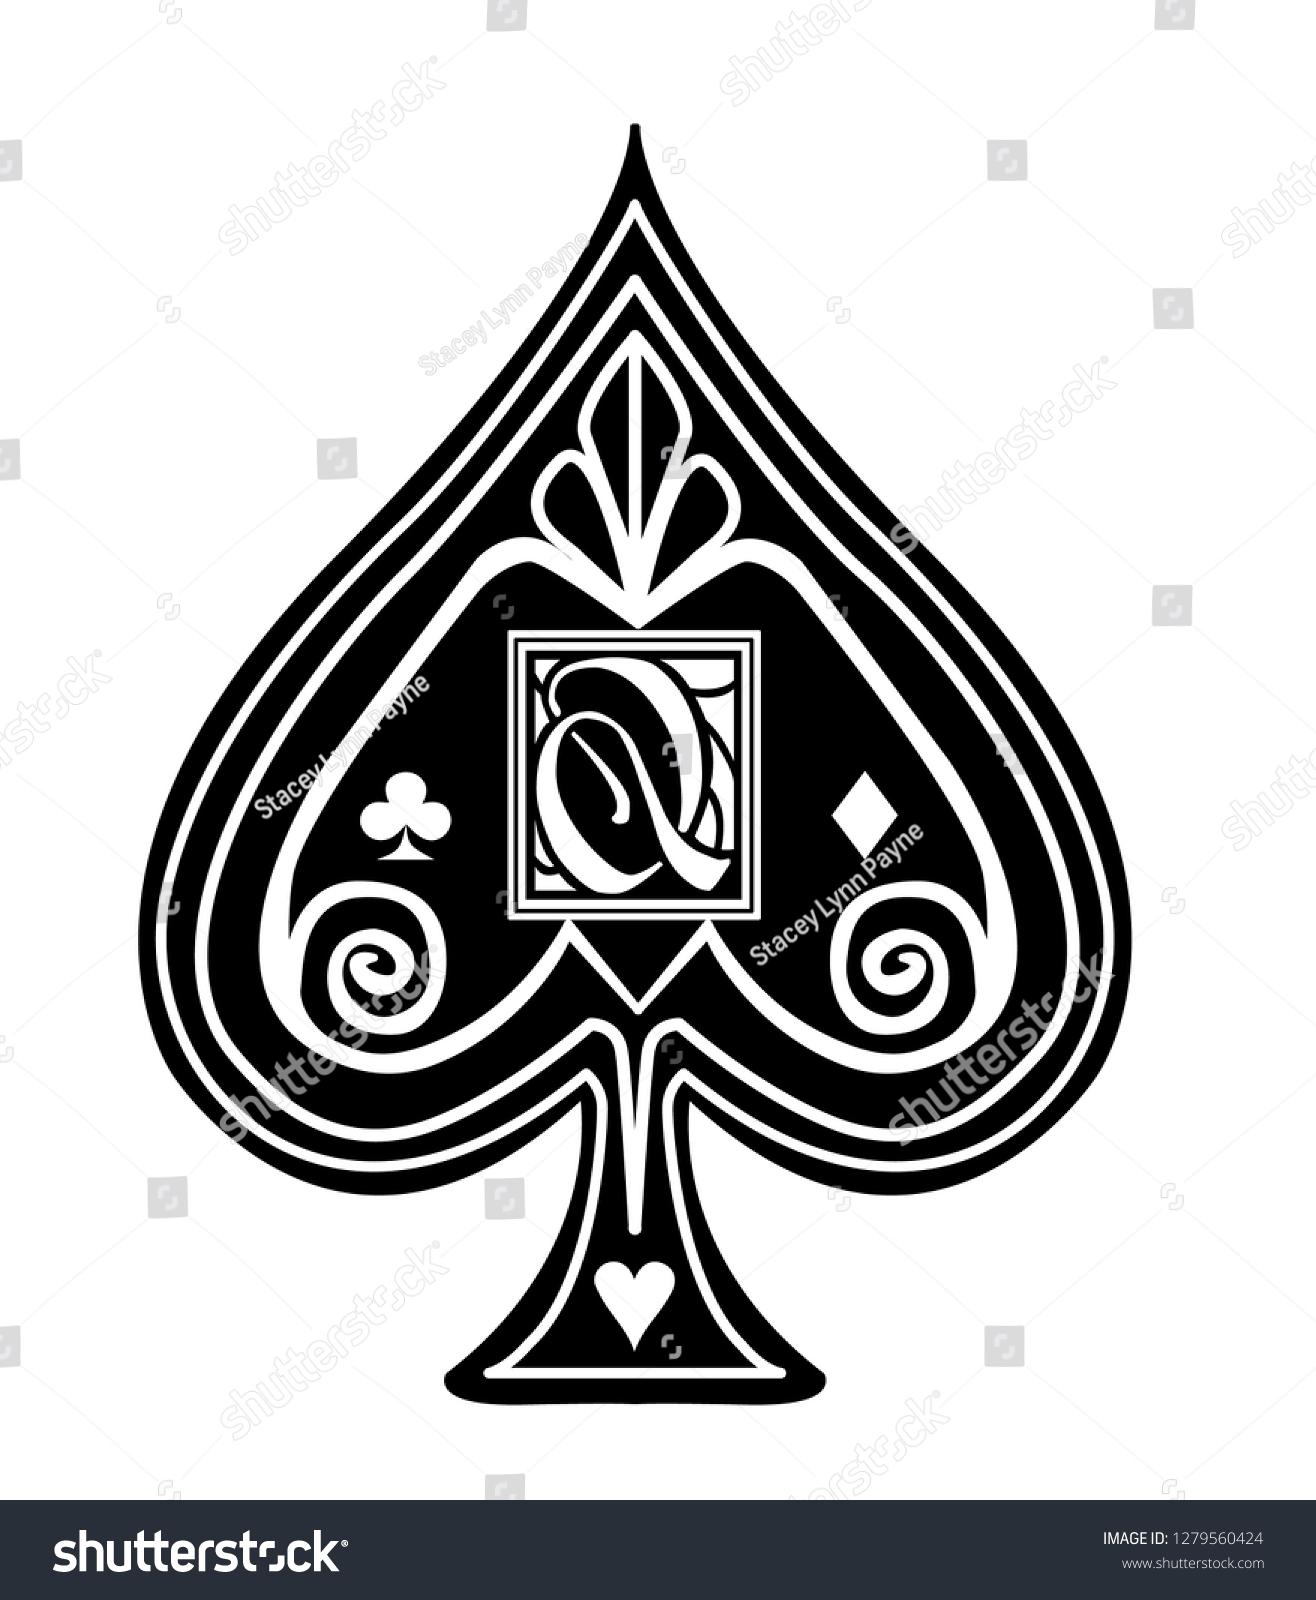 fancy spade card  Fancy Black Spade Card Suit Q Stock Vector (Royalty Free ...